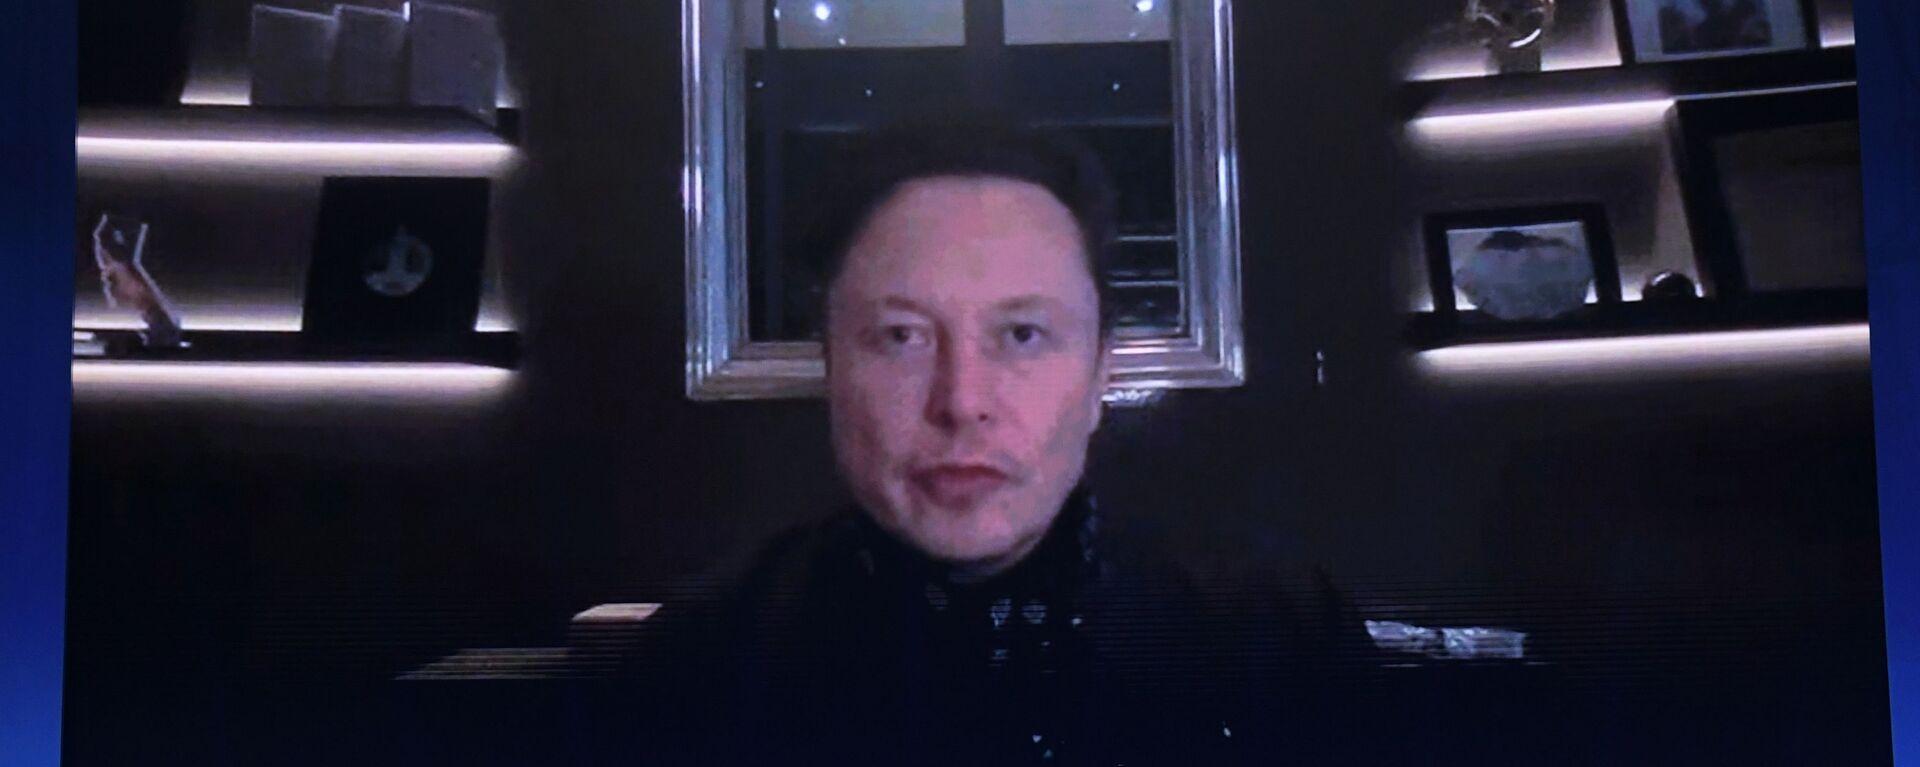 Elon Musk. - Sputnik Polska, 1920, 22.05.2021